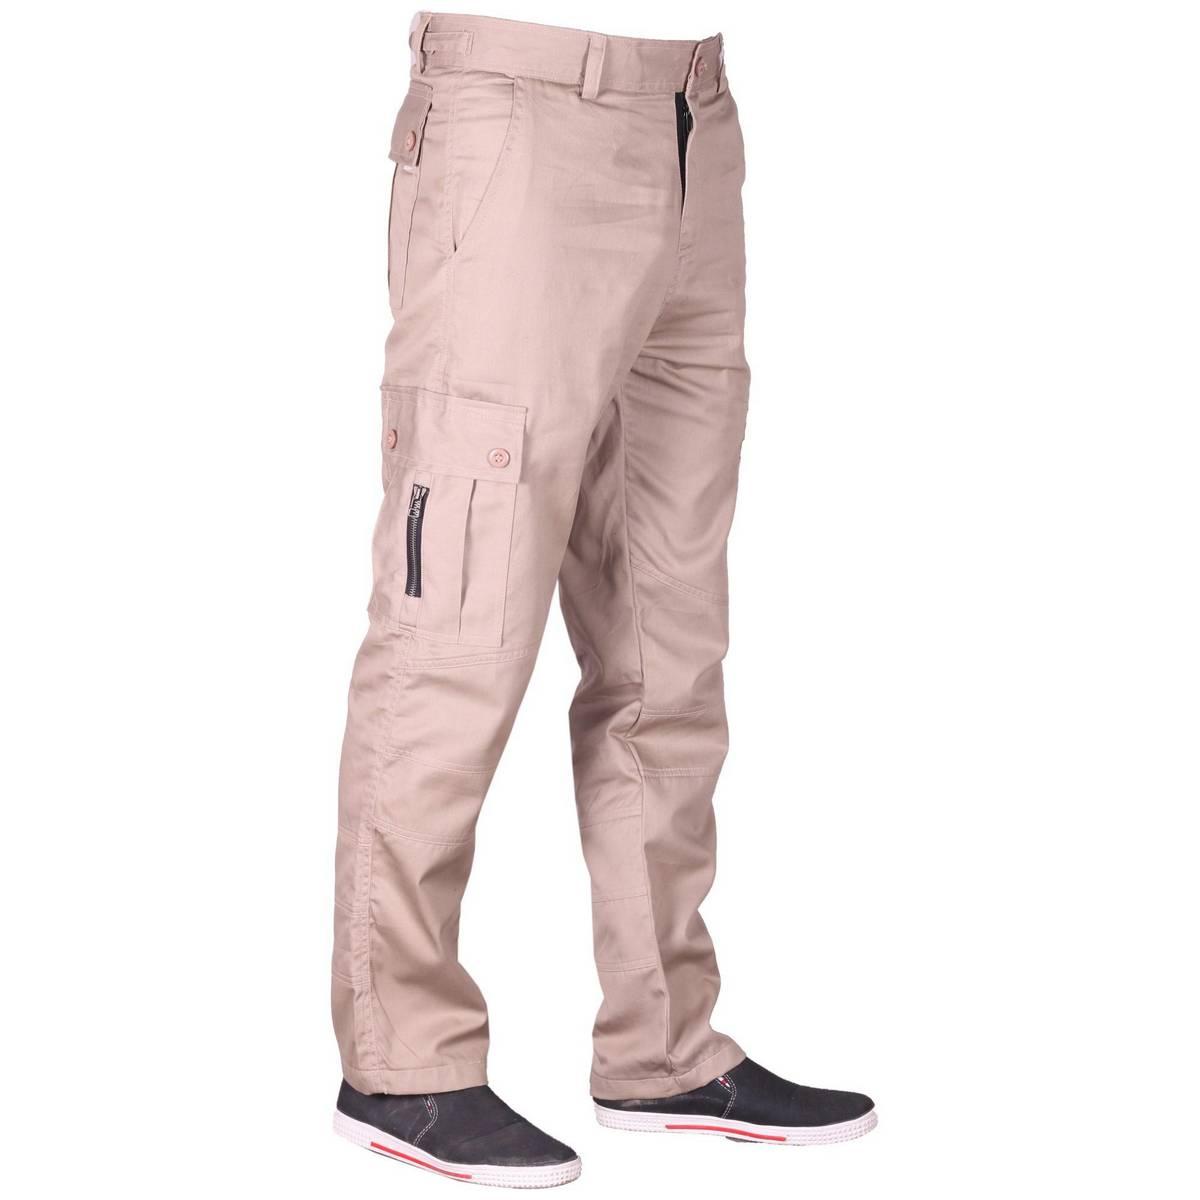 Men'S Tactical Multiple Pro Cargo Pants - Cargo Trouser